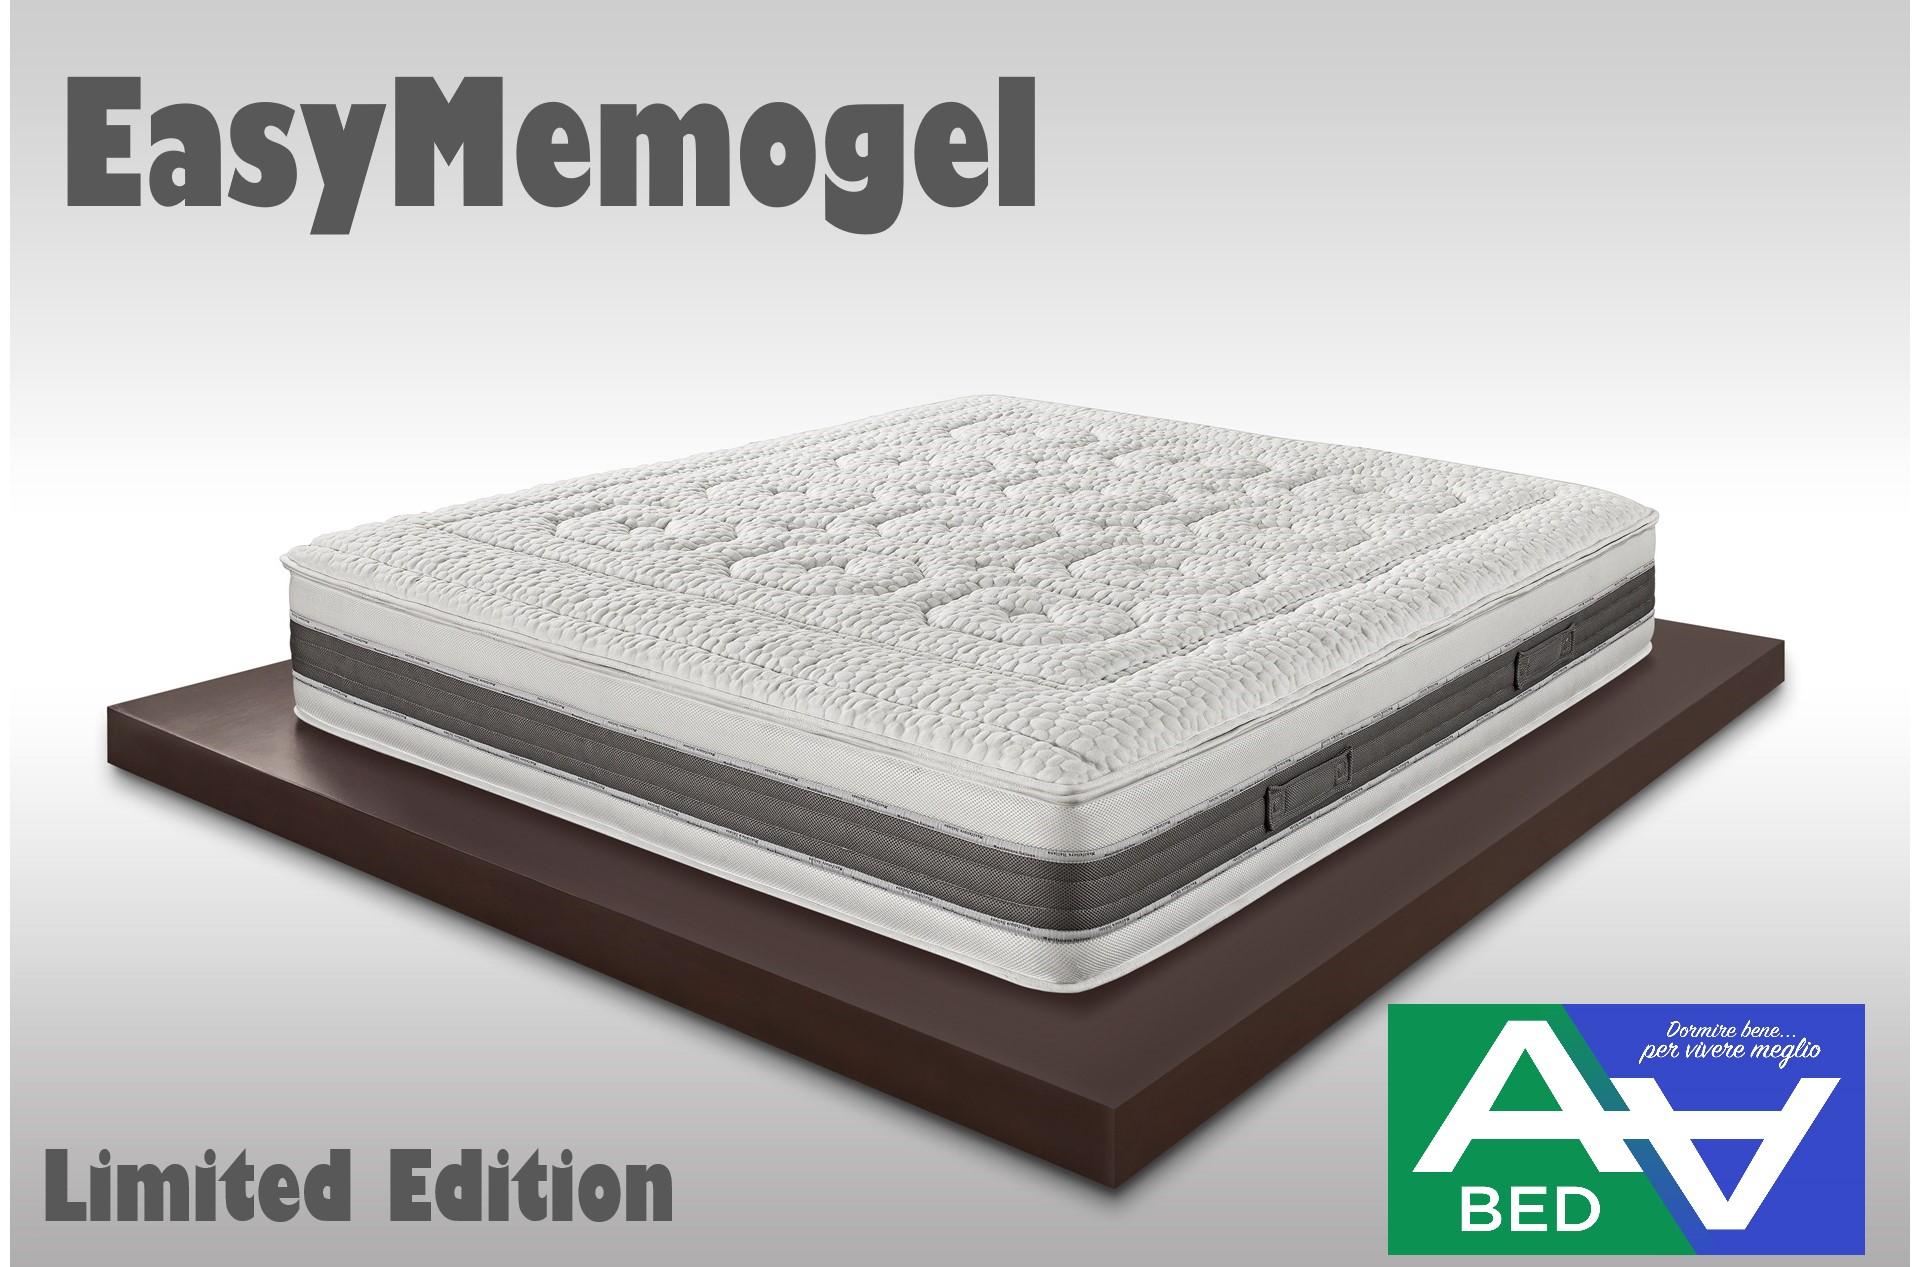 2.EASY MEMOGEL - Materasso a molle indipendenti, viscopur aloe e memory air  sense|